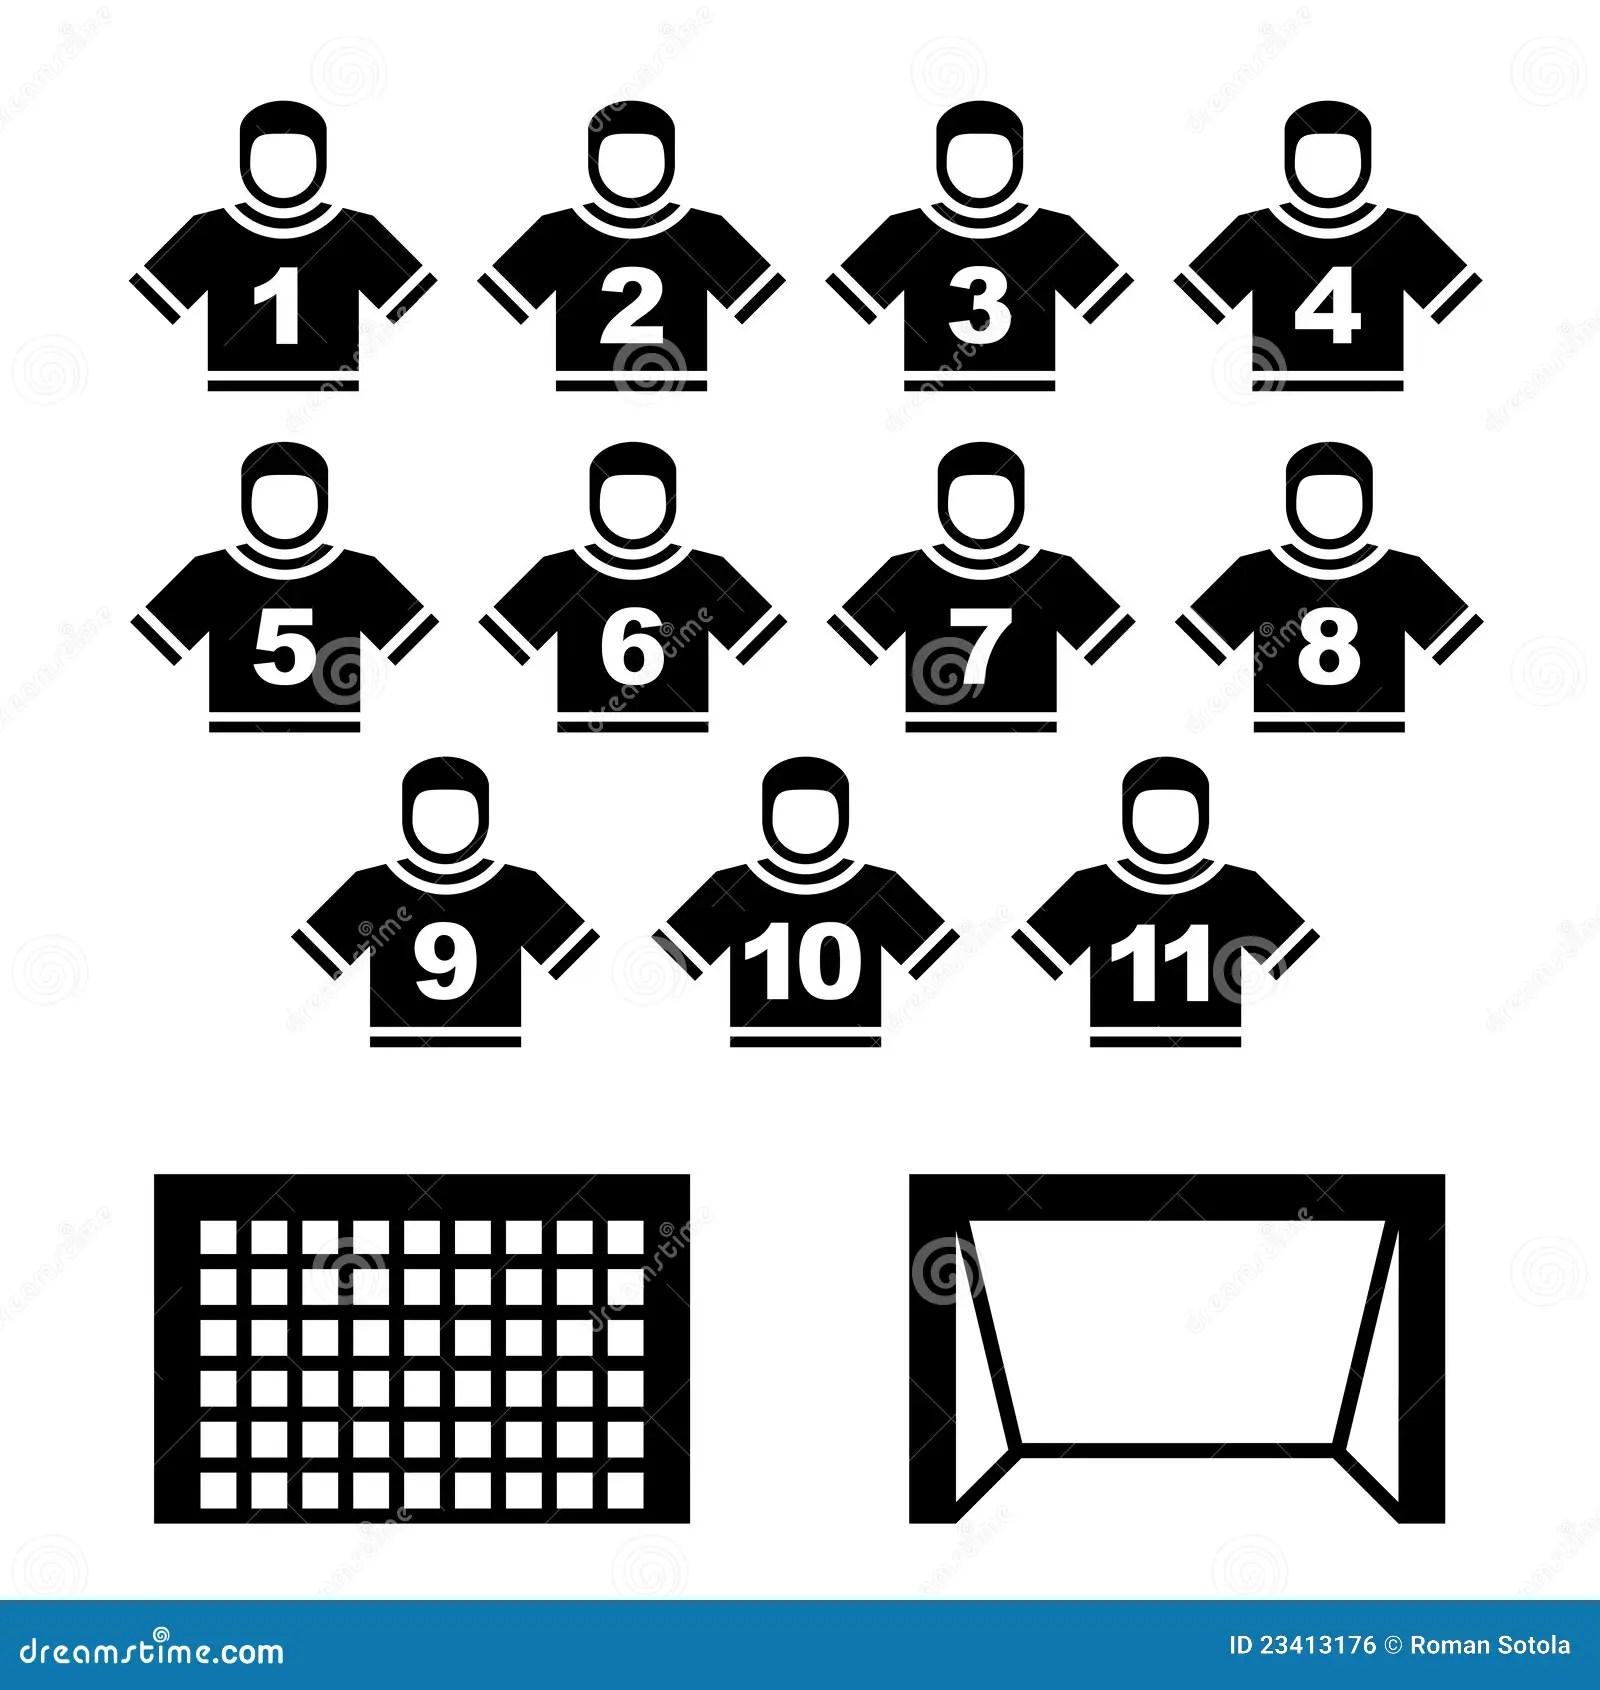 Football Team Black Symbols Royalty Free Stock Image